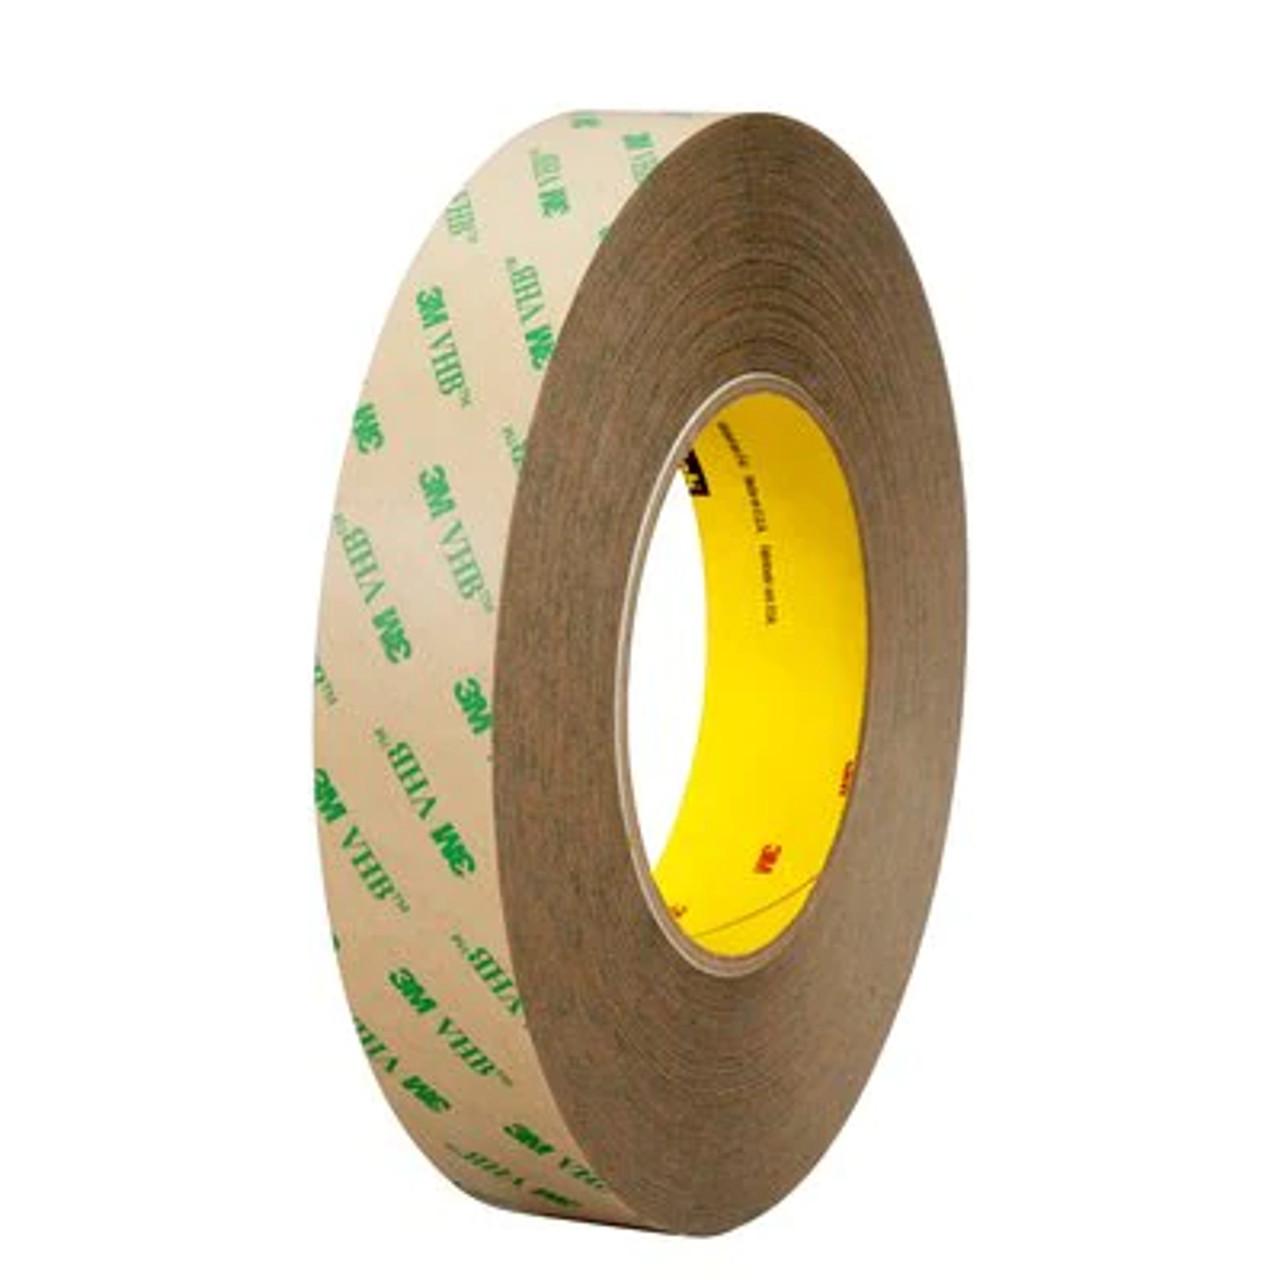 3M™ VHB™ Adhesive Transfer Tape F9469PC, Clear, 24 in x 60 yd, 5 mil